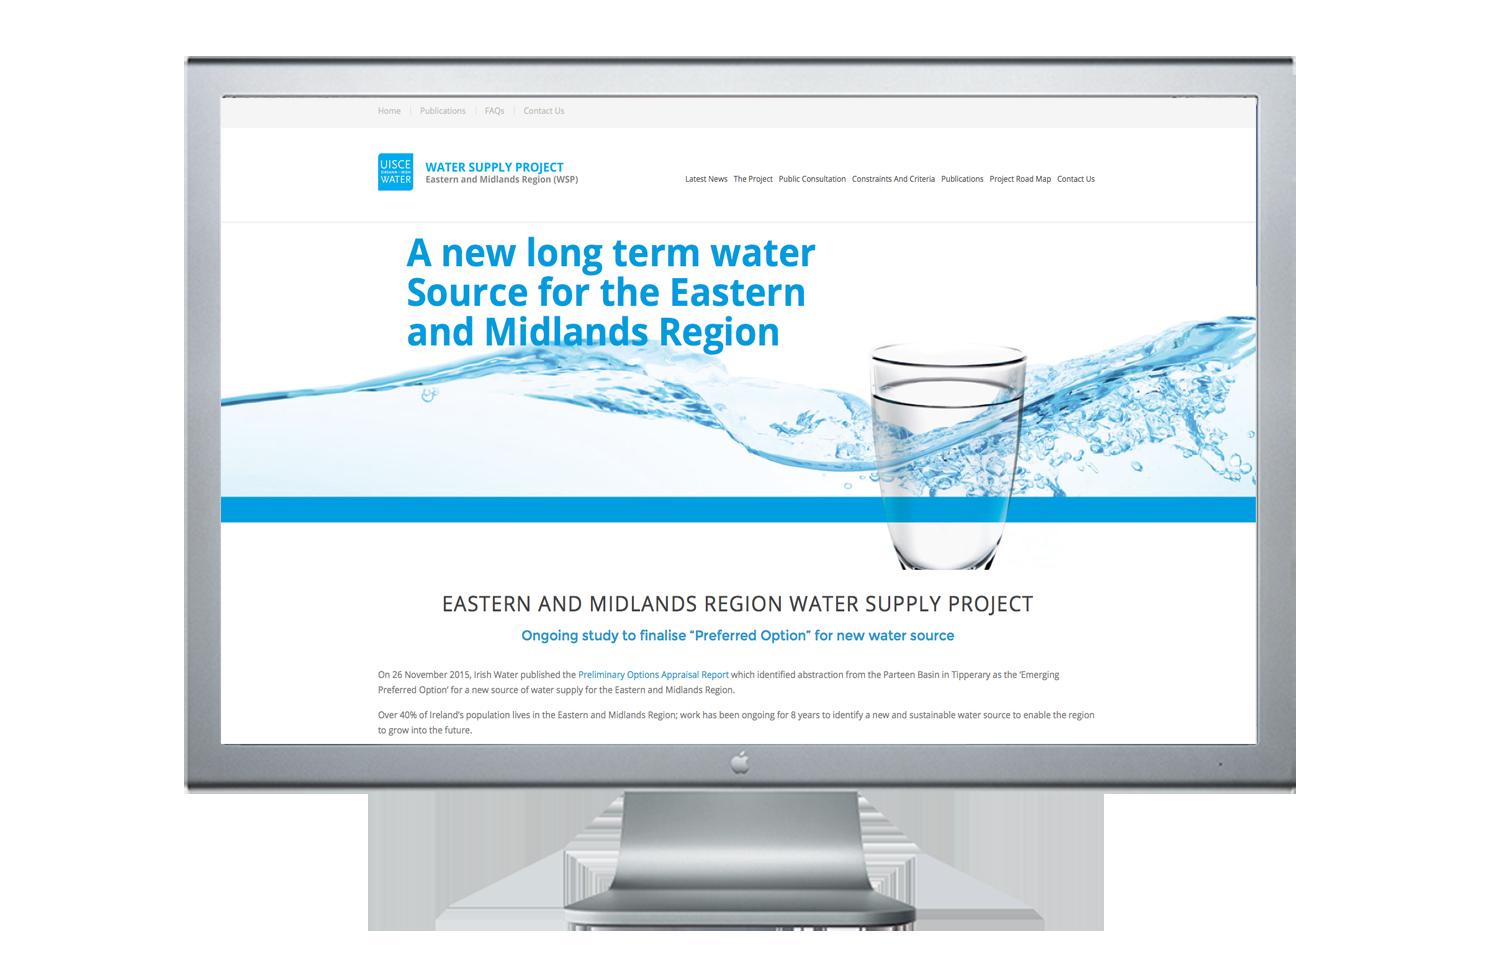 e_irish_water_website_design_wicklow